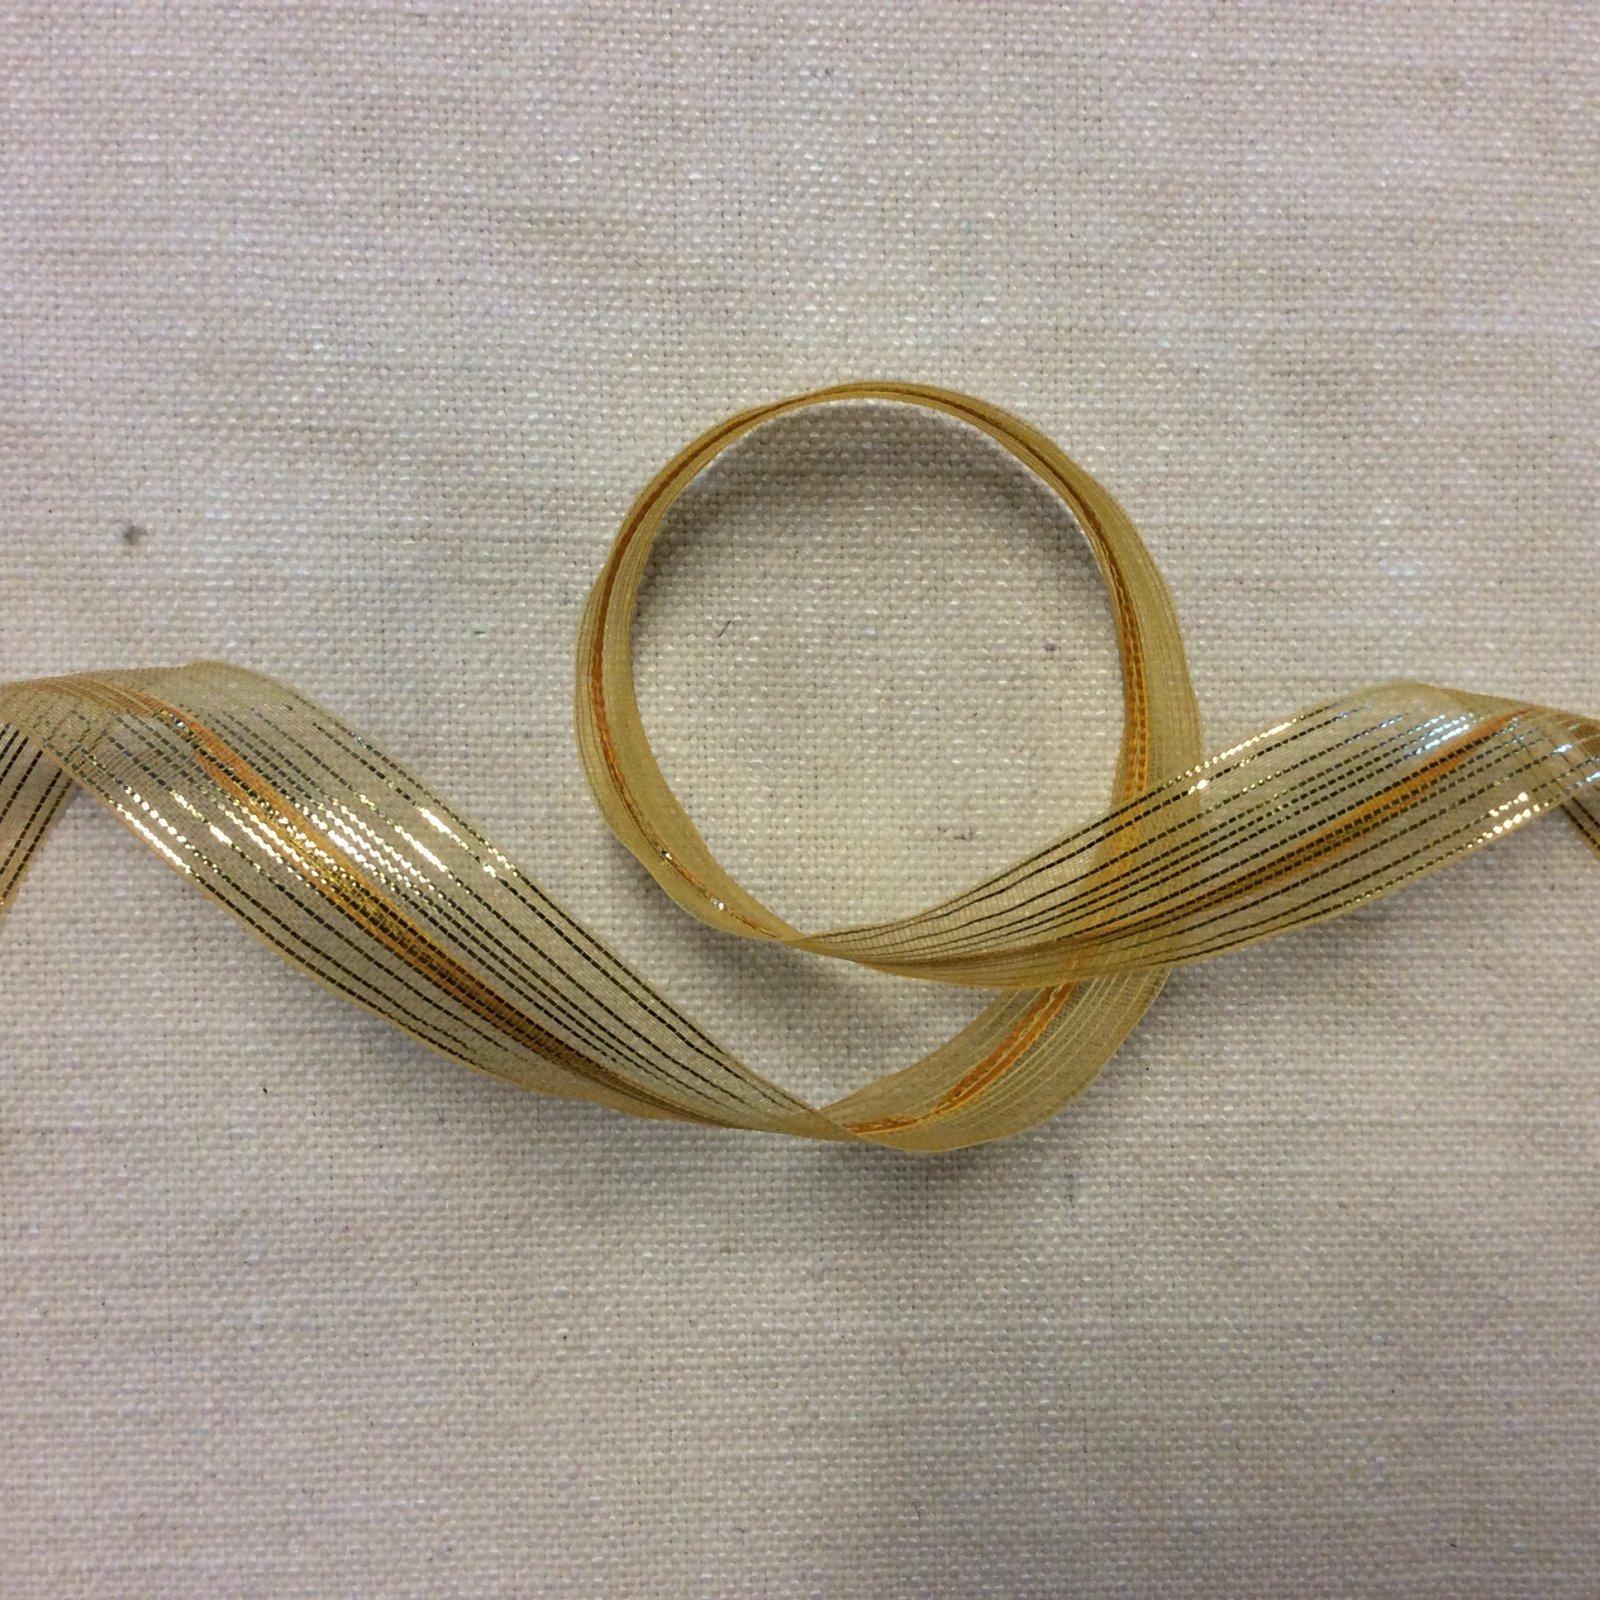 Organza Ribbon 1 Vintage Gold with Metallic Thread and Sewn on Cotton Braid Down Center Trim Ribbon RIB1191